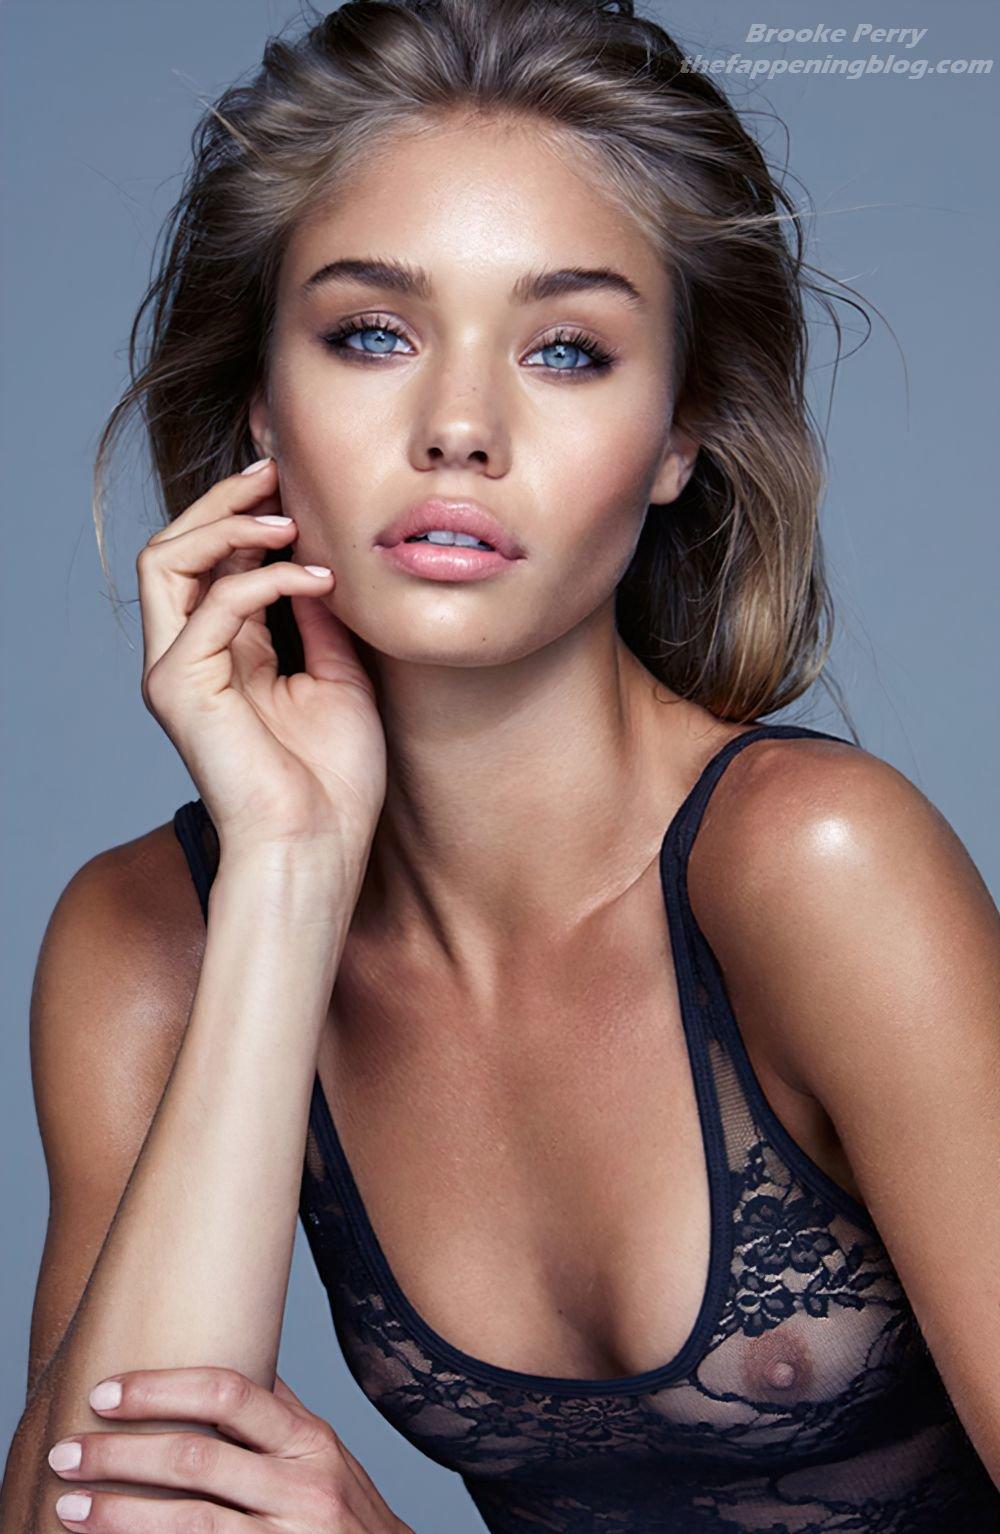 Brooke Perry Nude 1